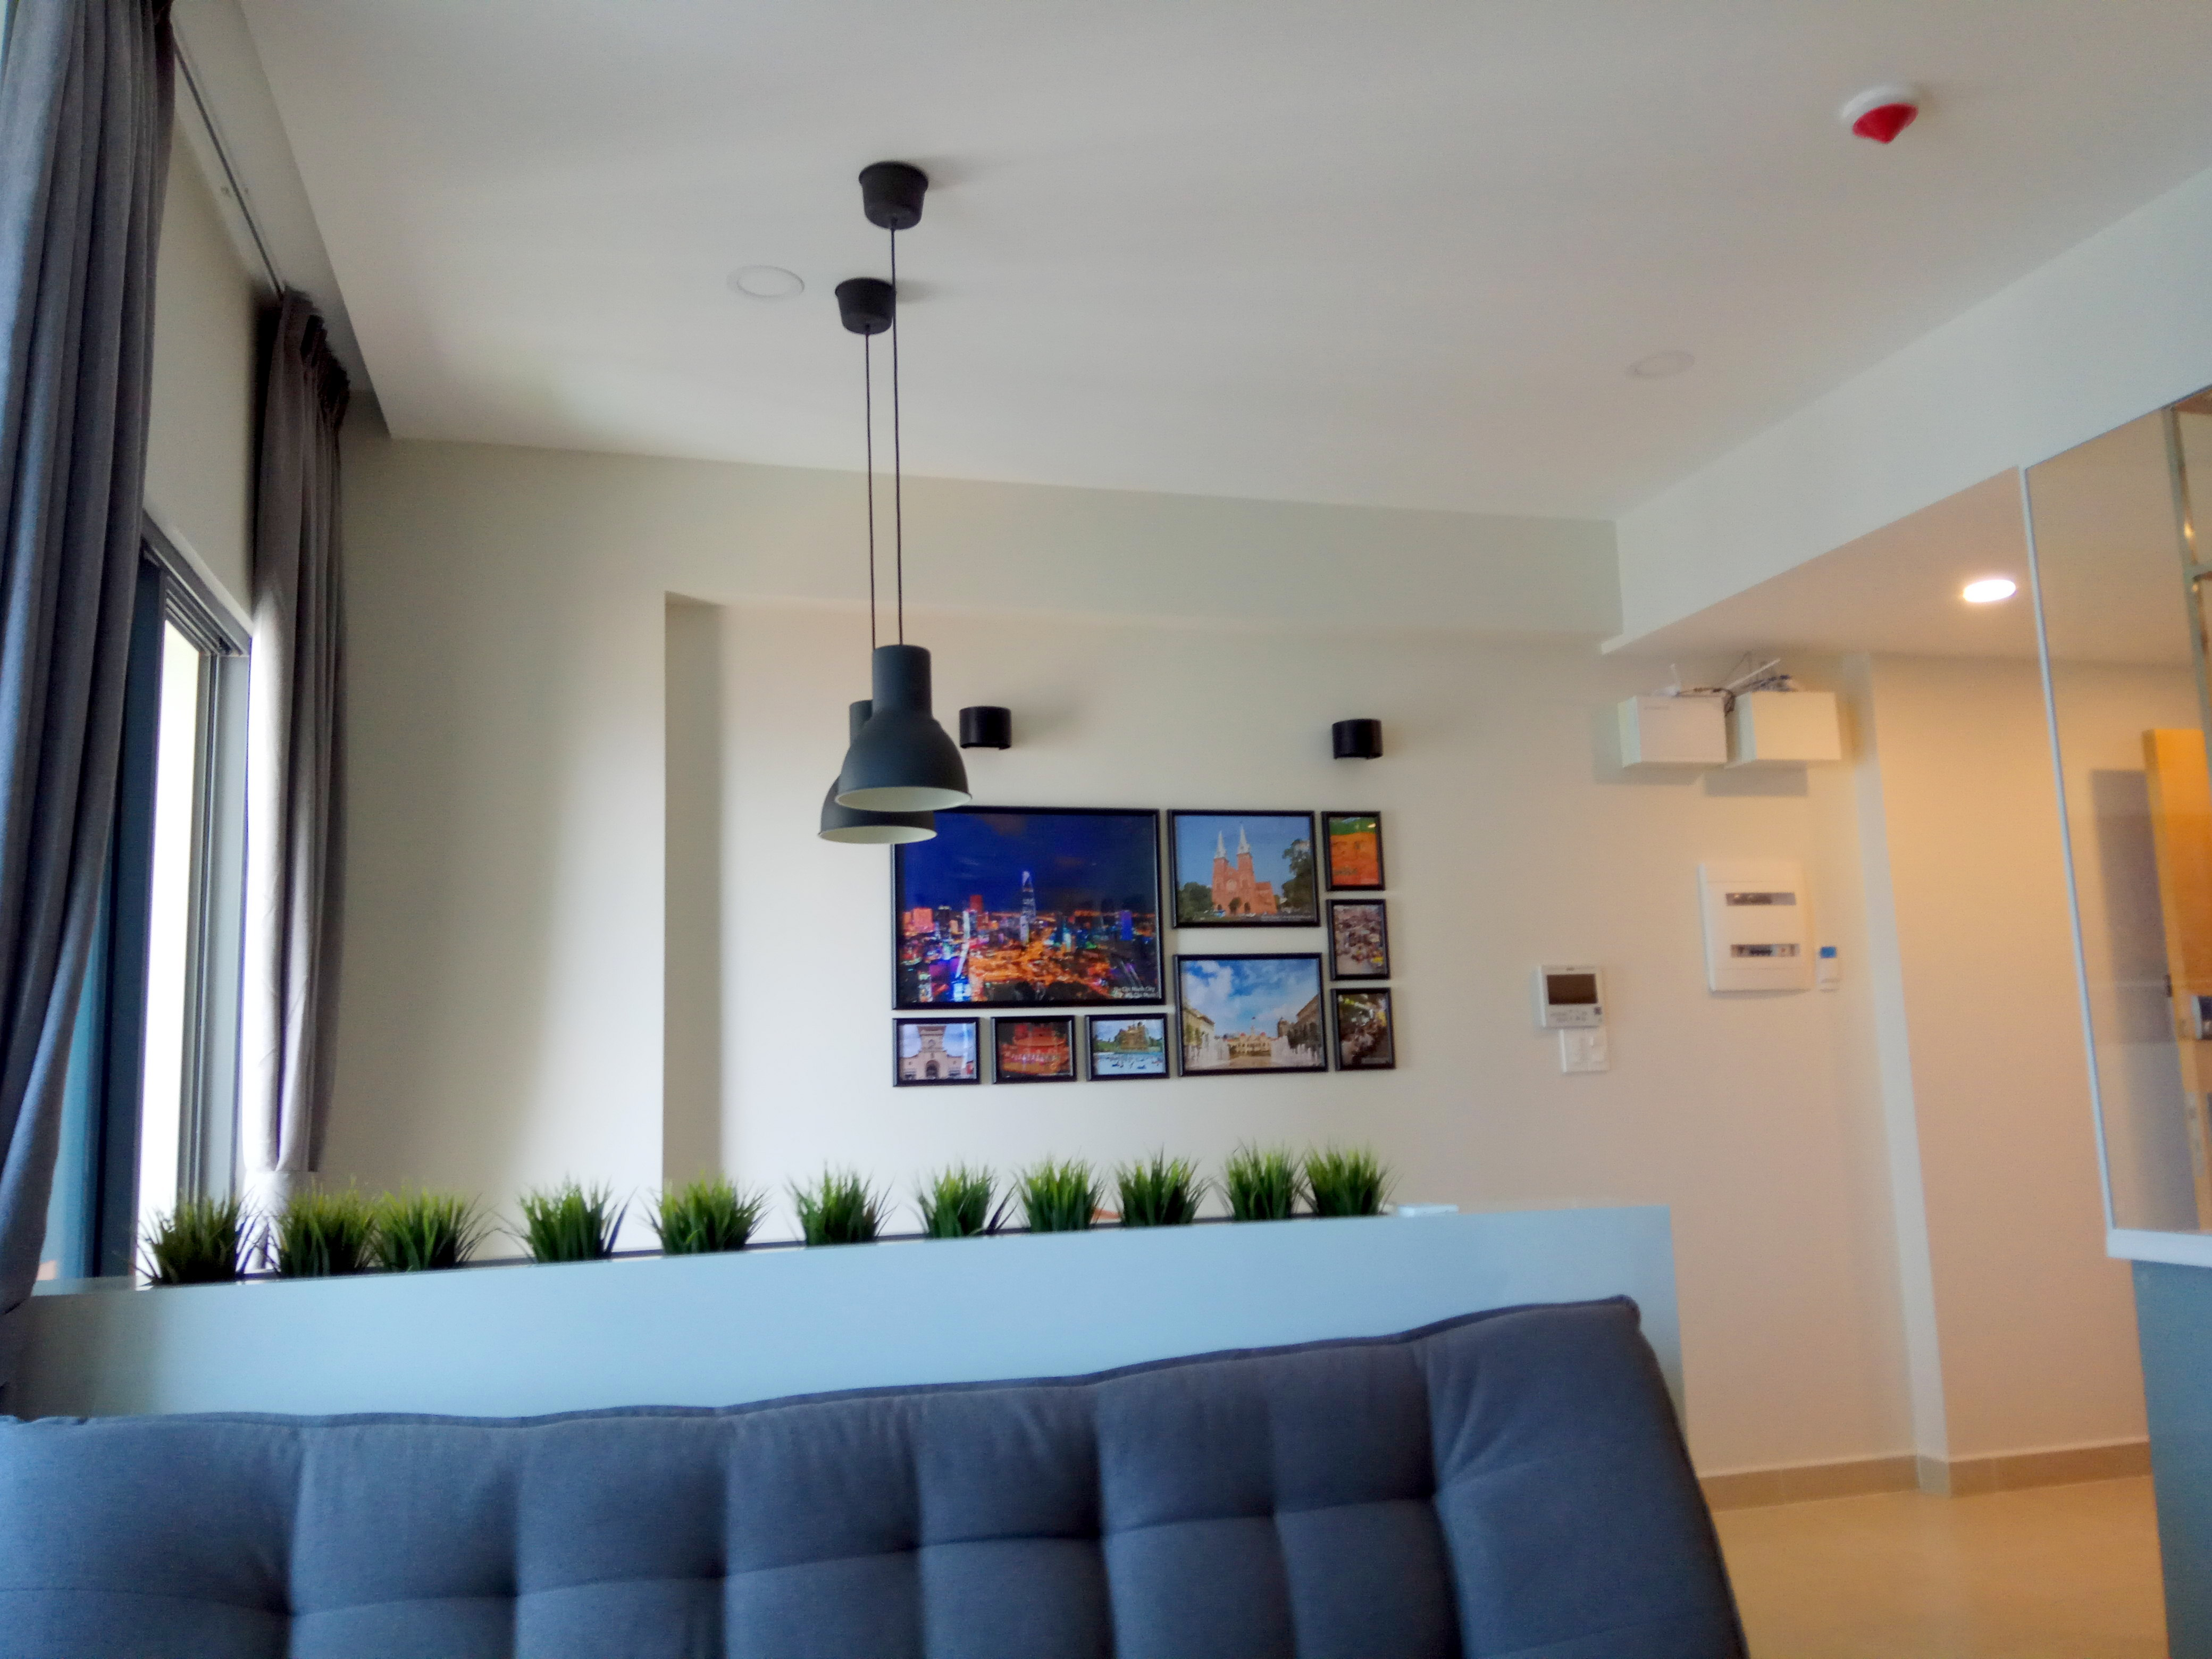 02.T2A 27.09 Livingroom 02 - 02.T2A-27.09_Livingroom_02